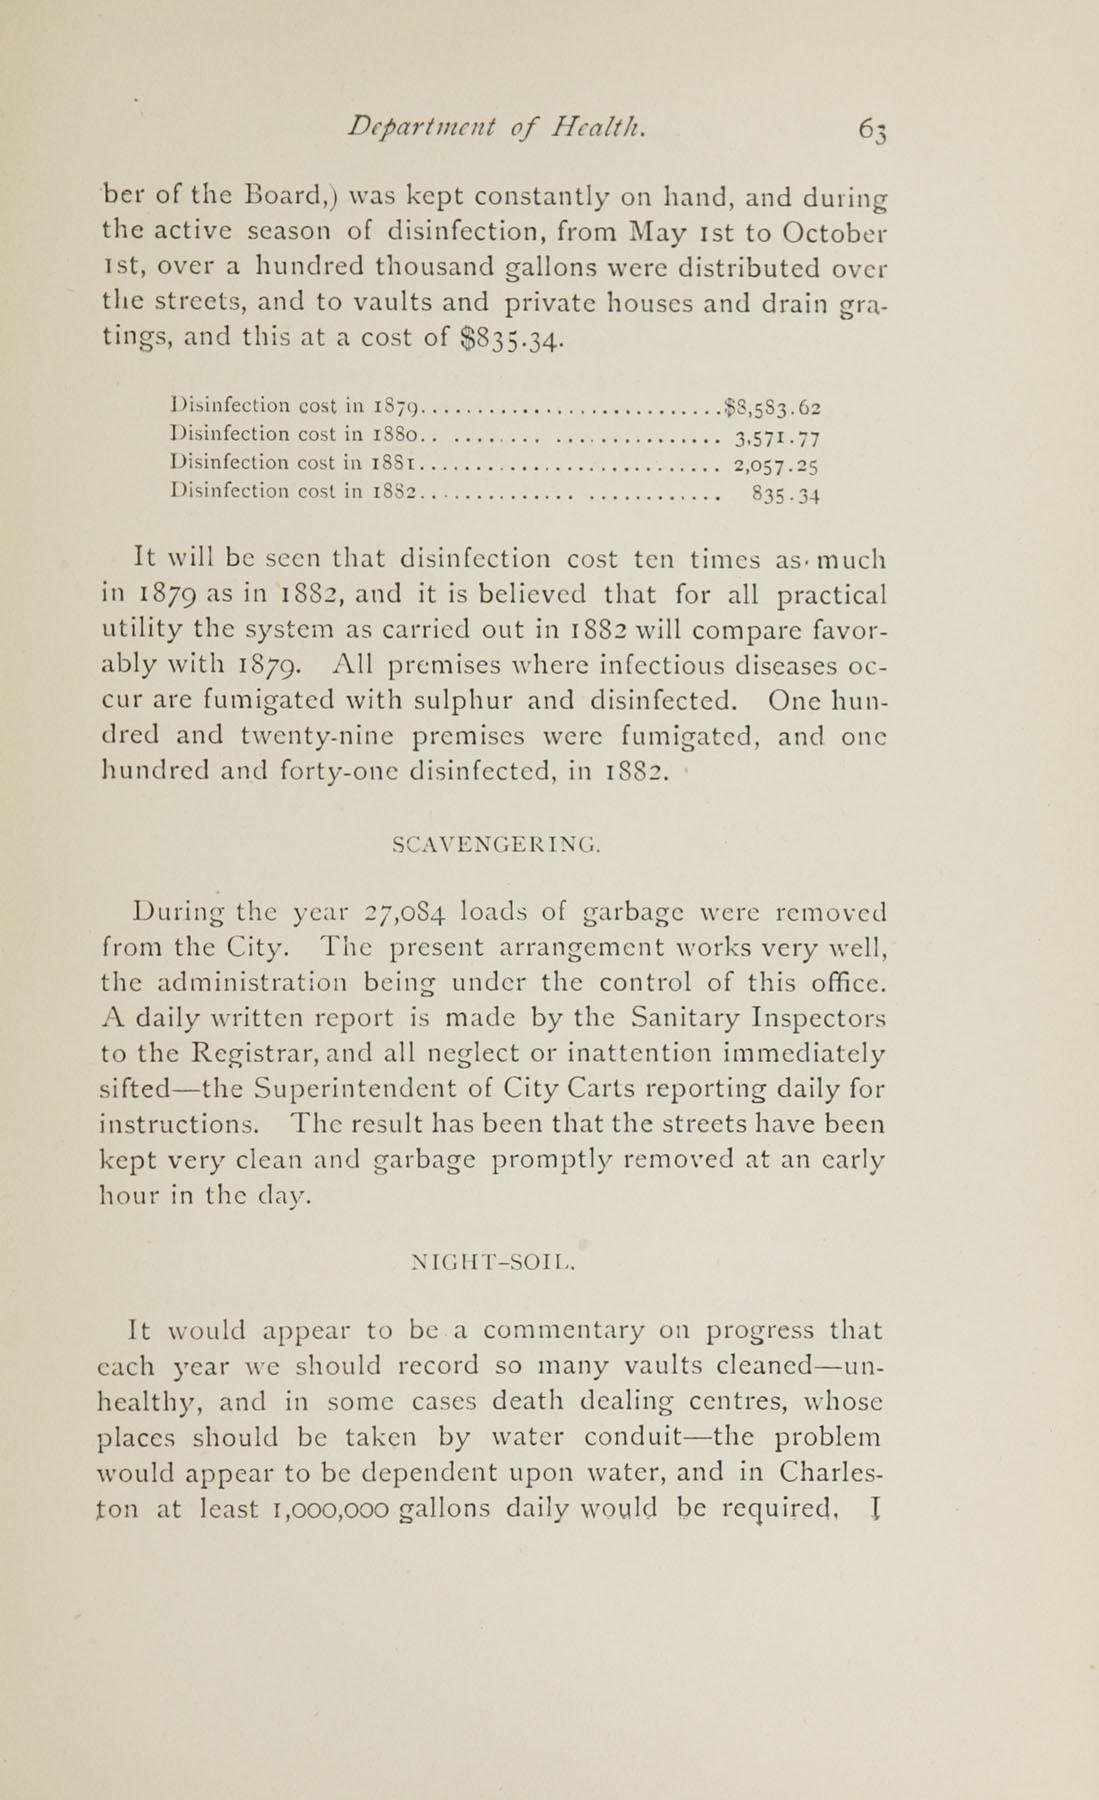 Charleston Yearbook, 1882, page 63